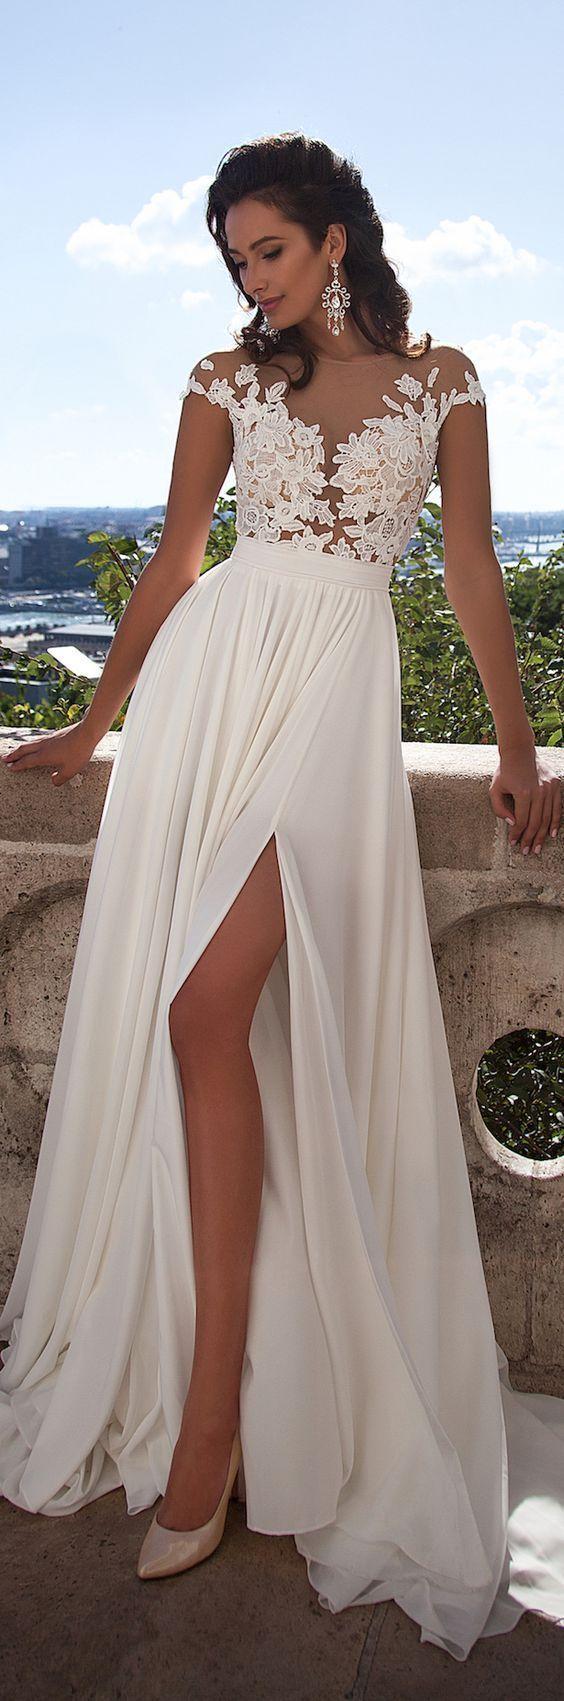 45 Casual Wedding Dresses Ideas for 2019 Weddings Beach